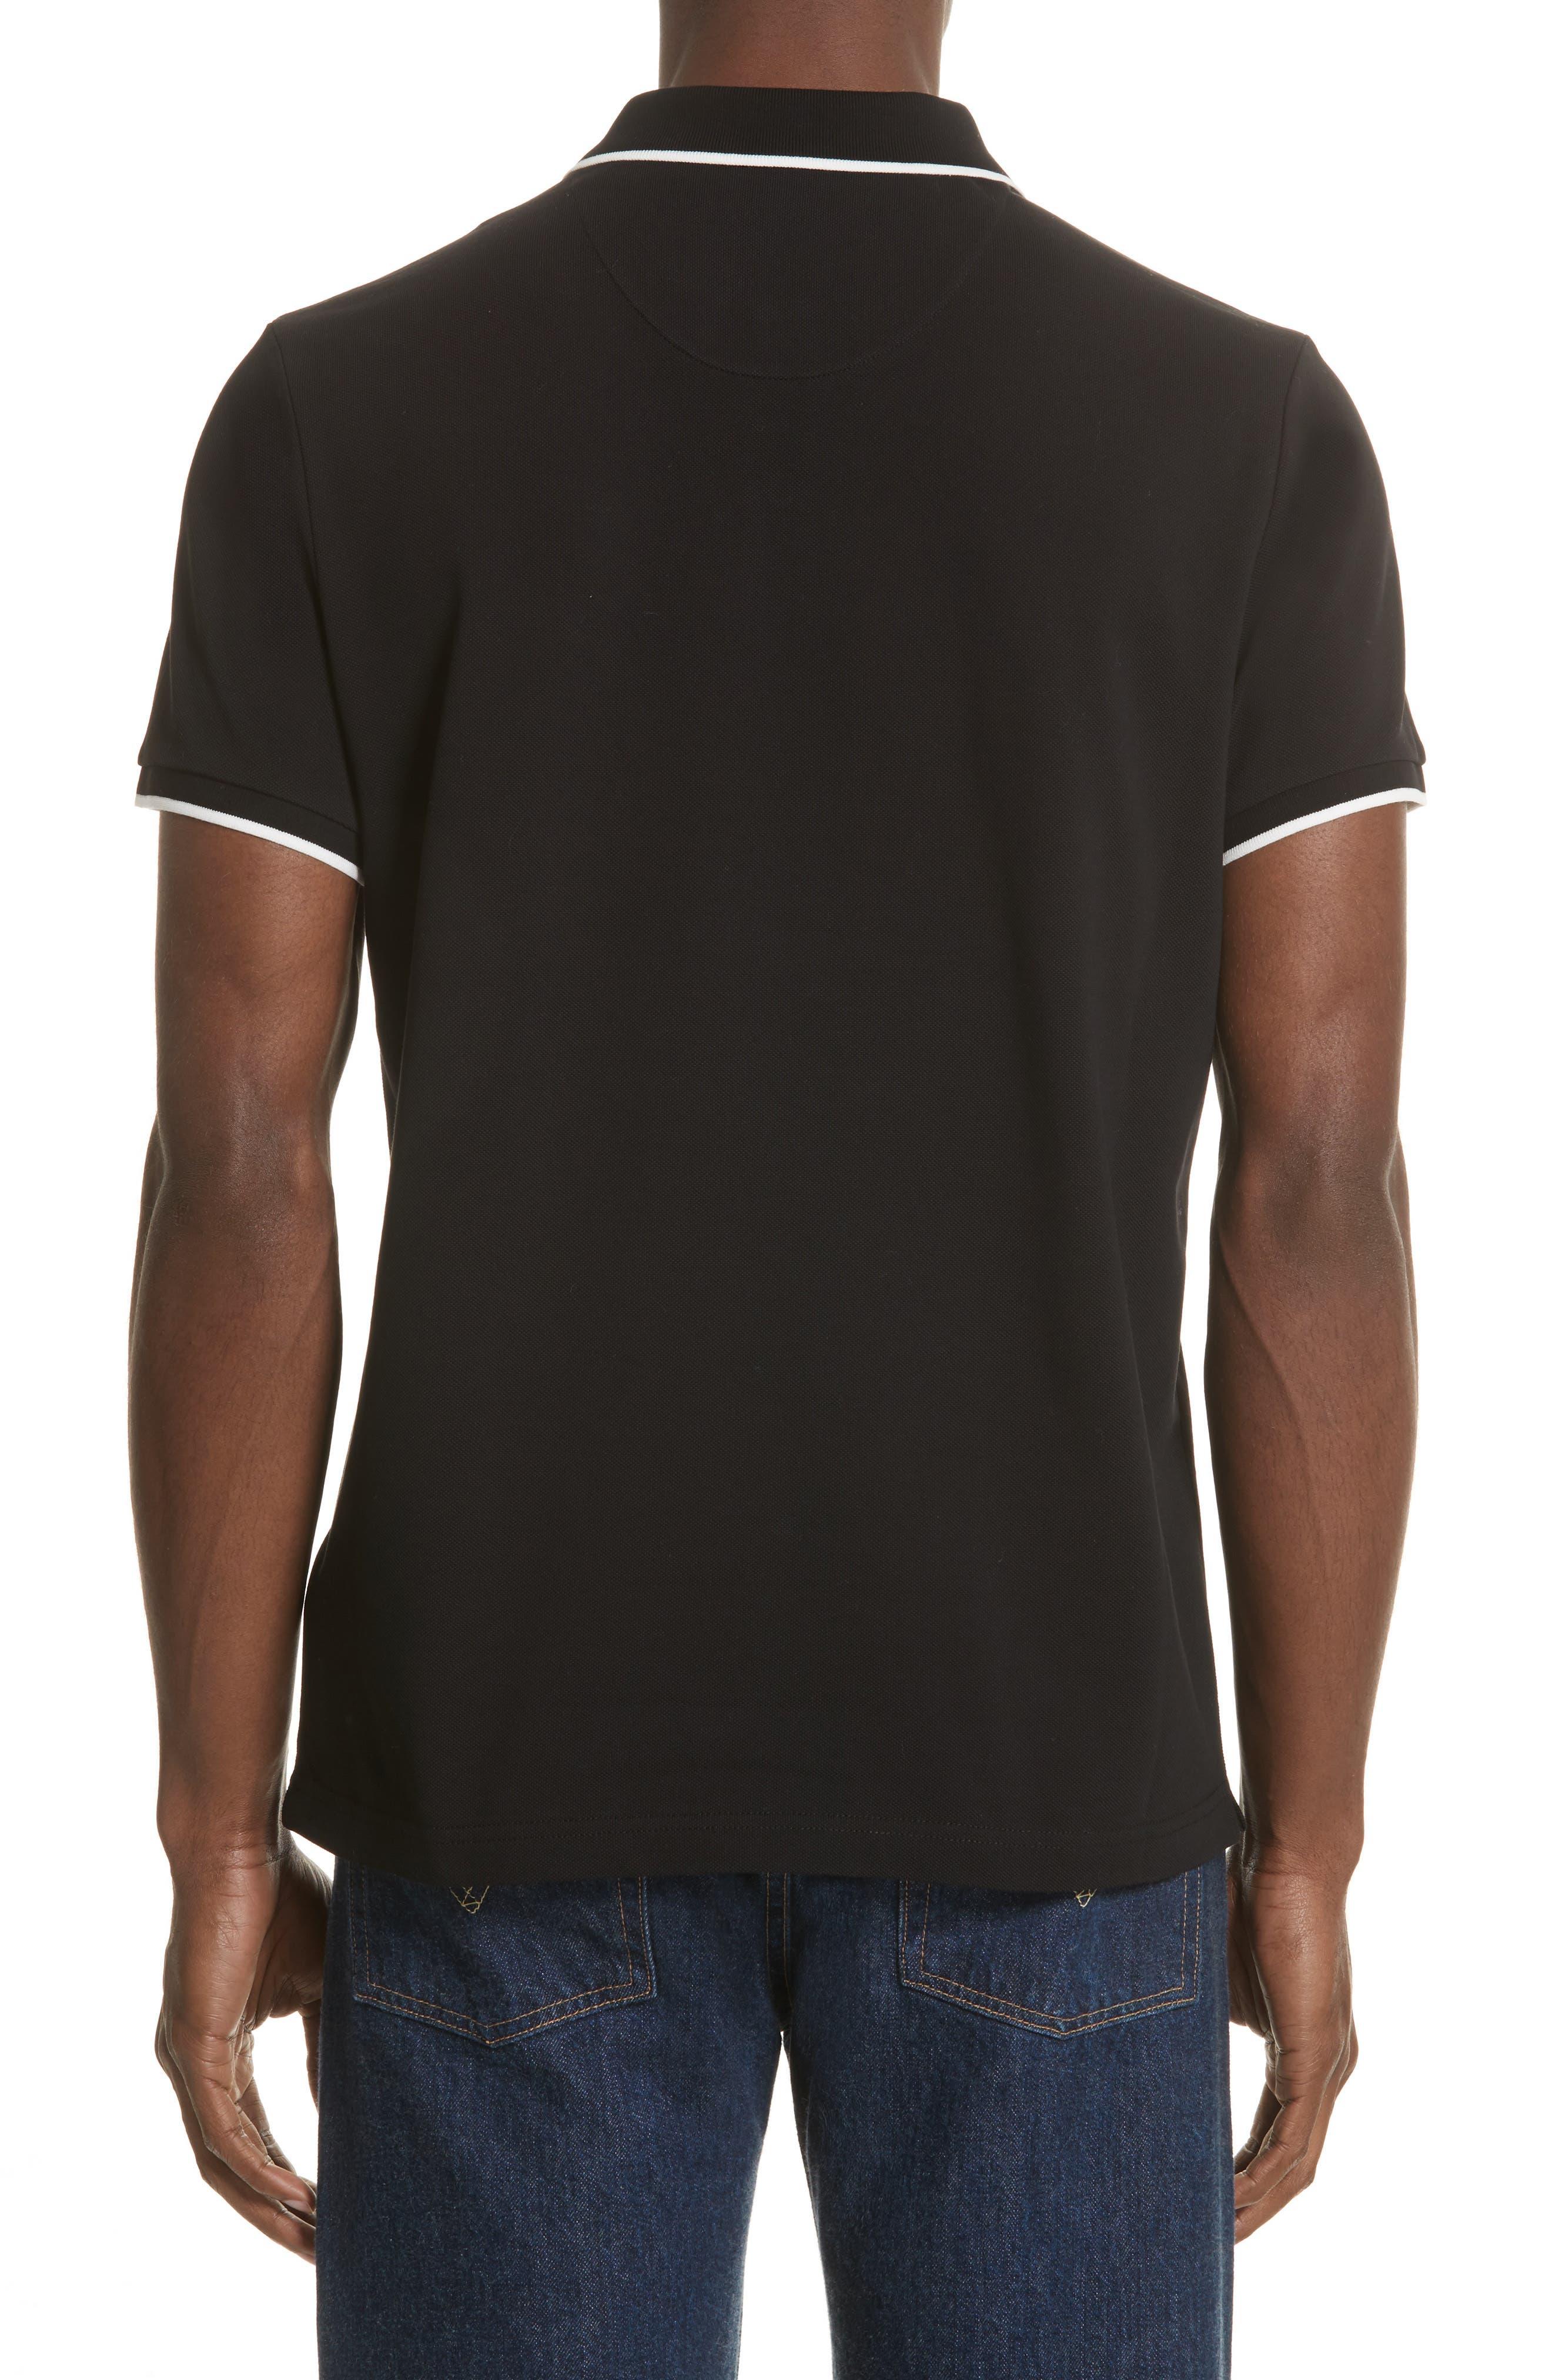 dae848961 Men s Moncler Polo Shirts